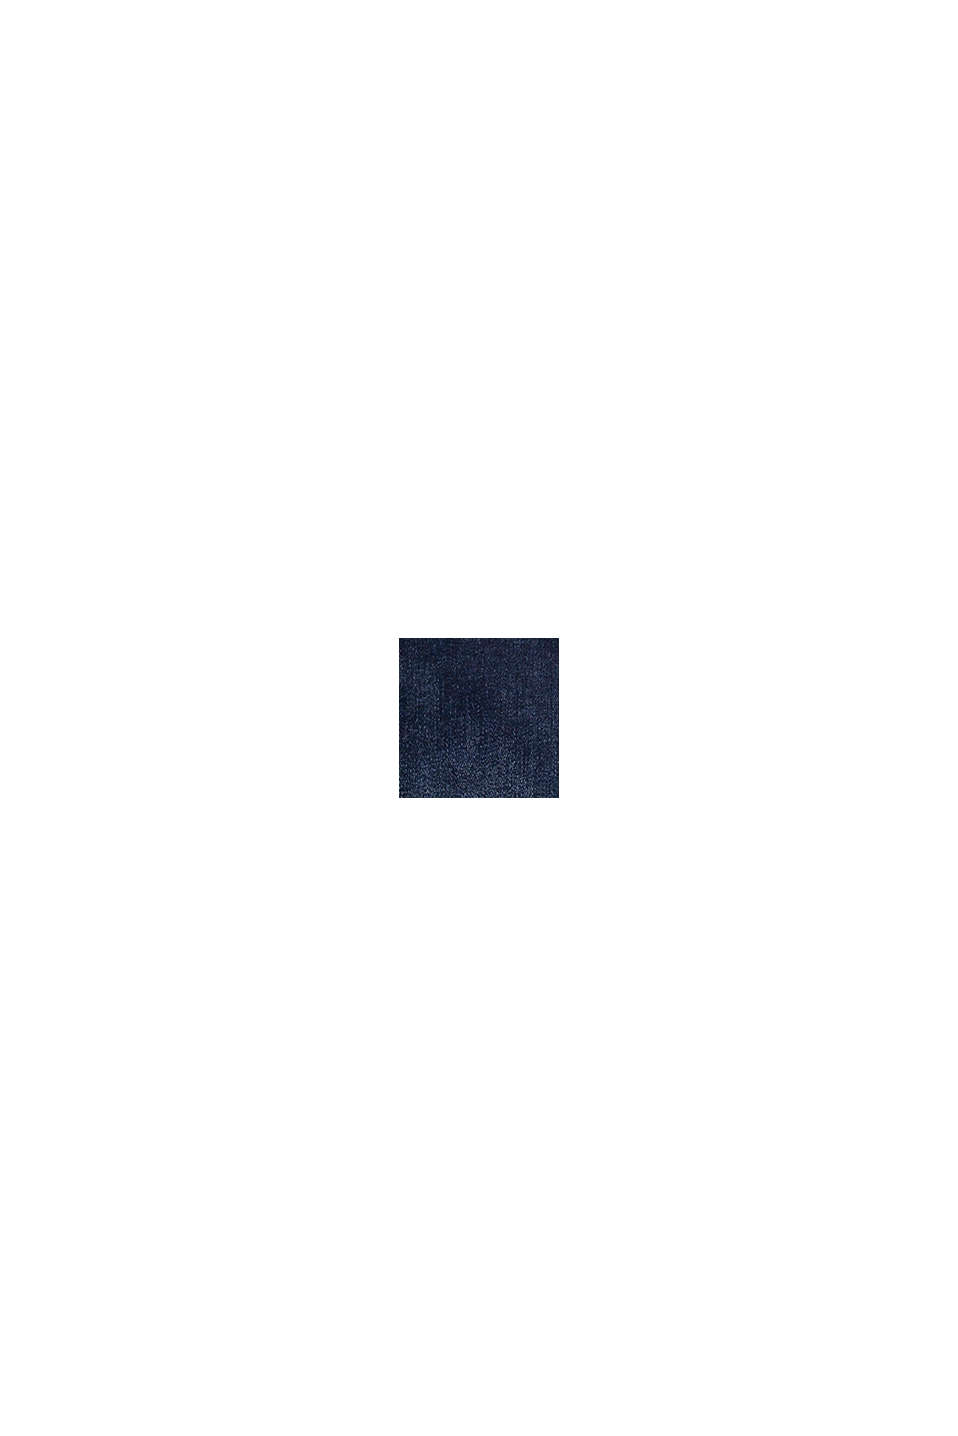 Reflekterande jeans med reglerbar linning, BLUE DARK WASHED, swatch